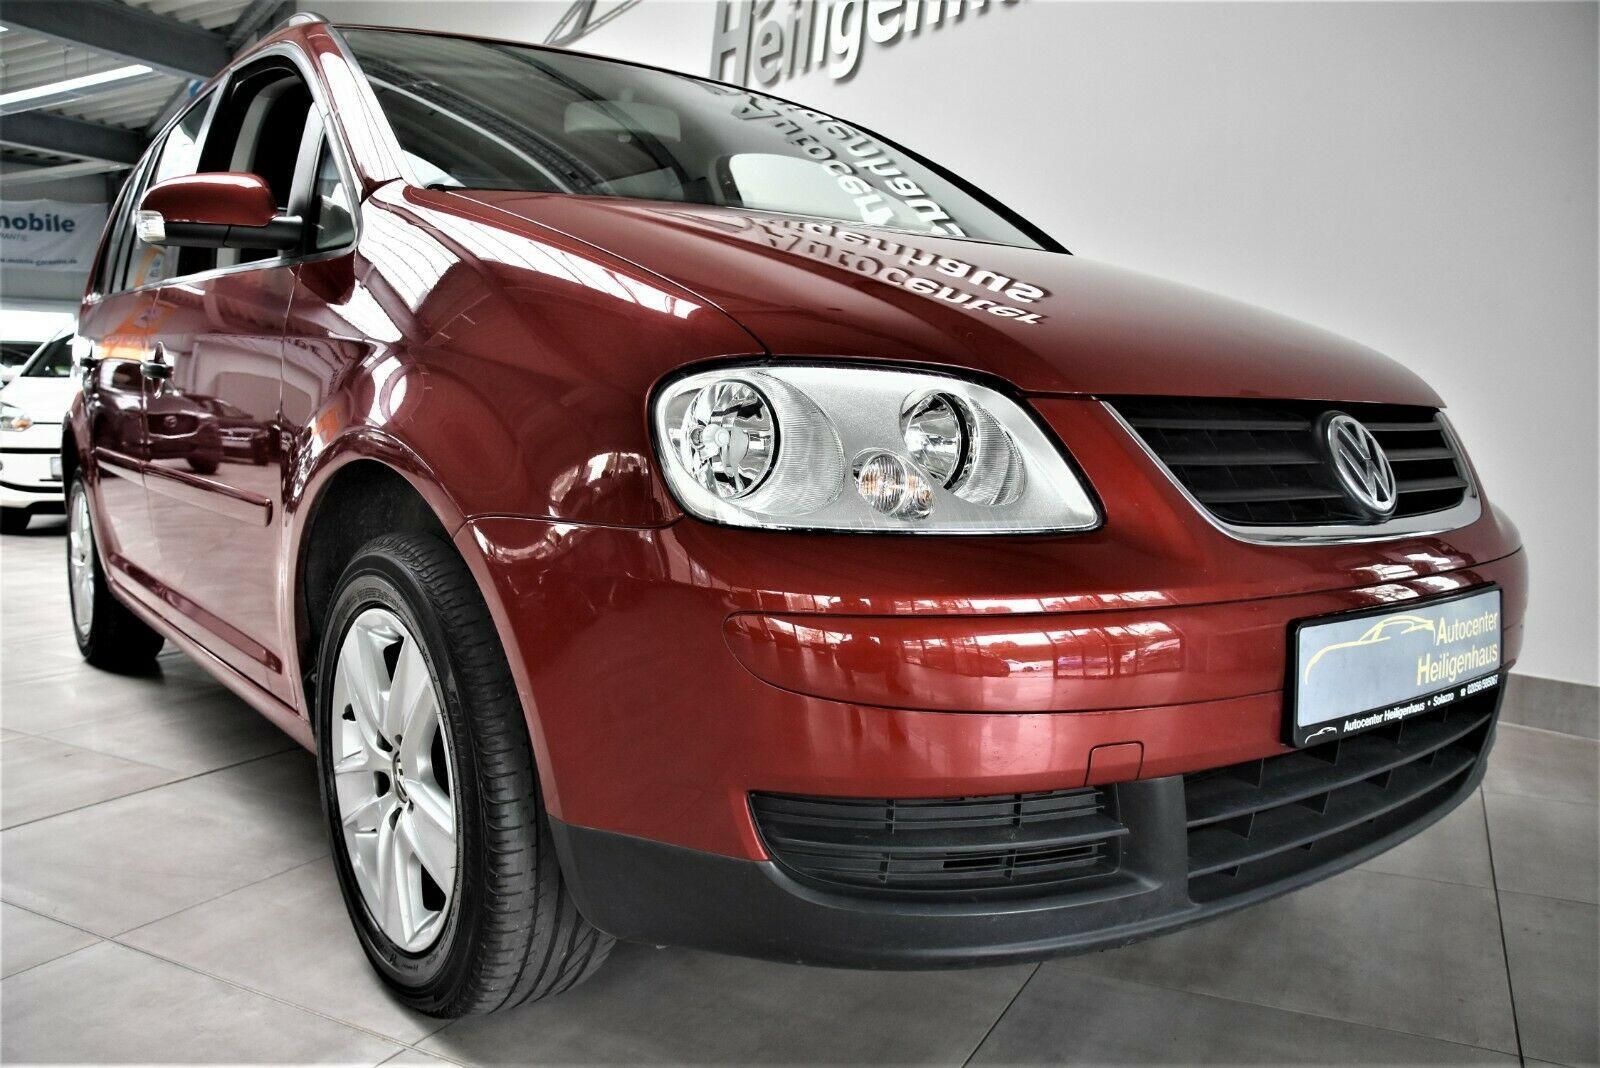 Volkswagen Touran 1.6 Conceptline Klima 7-Sitzer Tempo PDC